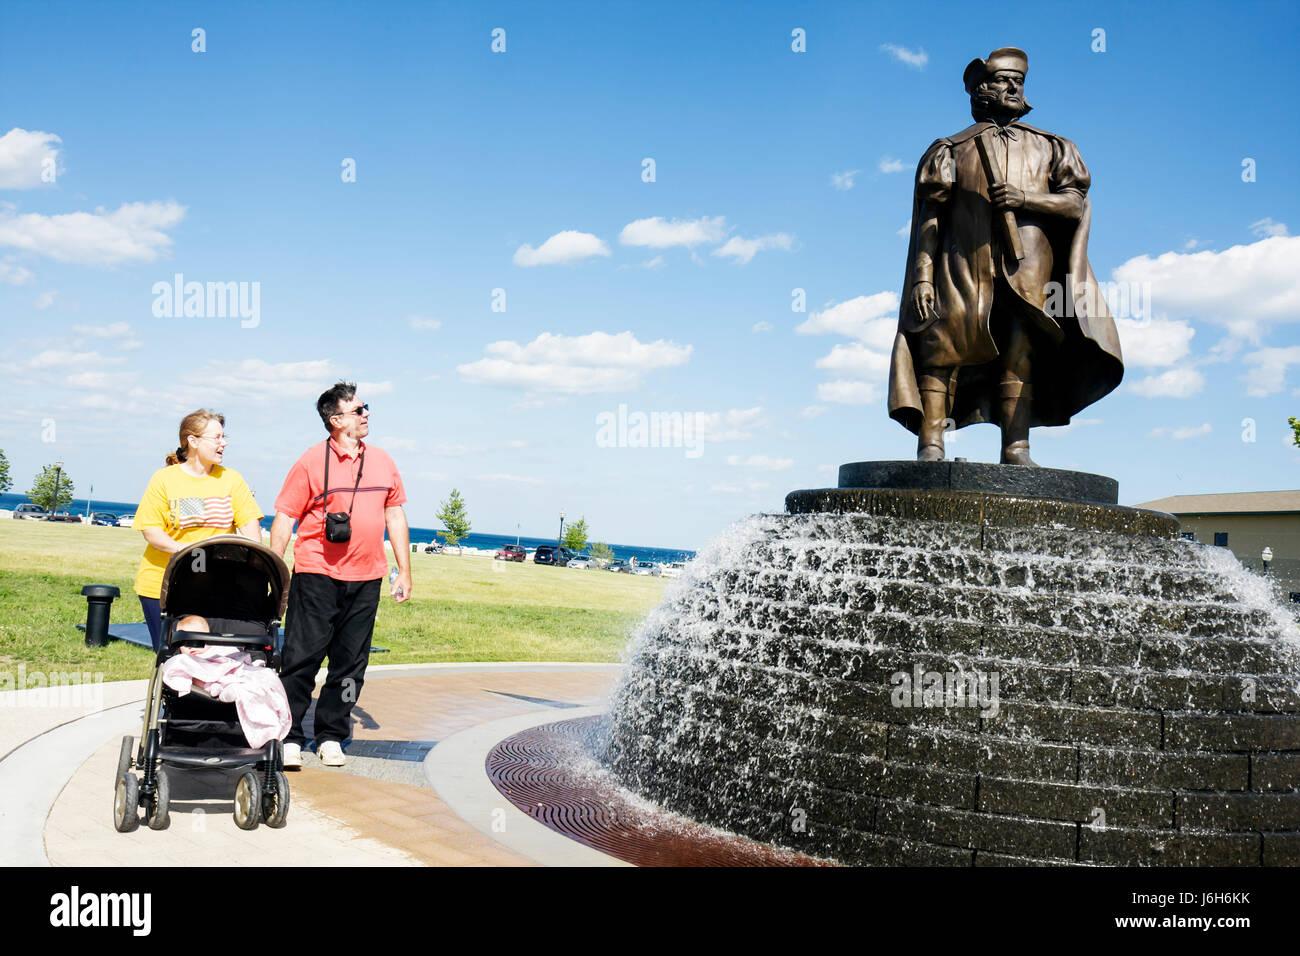 Wisconsin Kenosha Harbor Park Christopher Columbus statue public fountain man woman baby family stroller honor immigrants - Stock Image